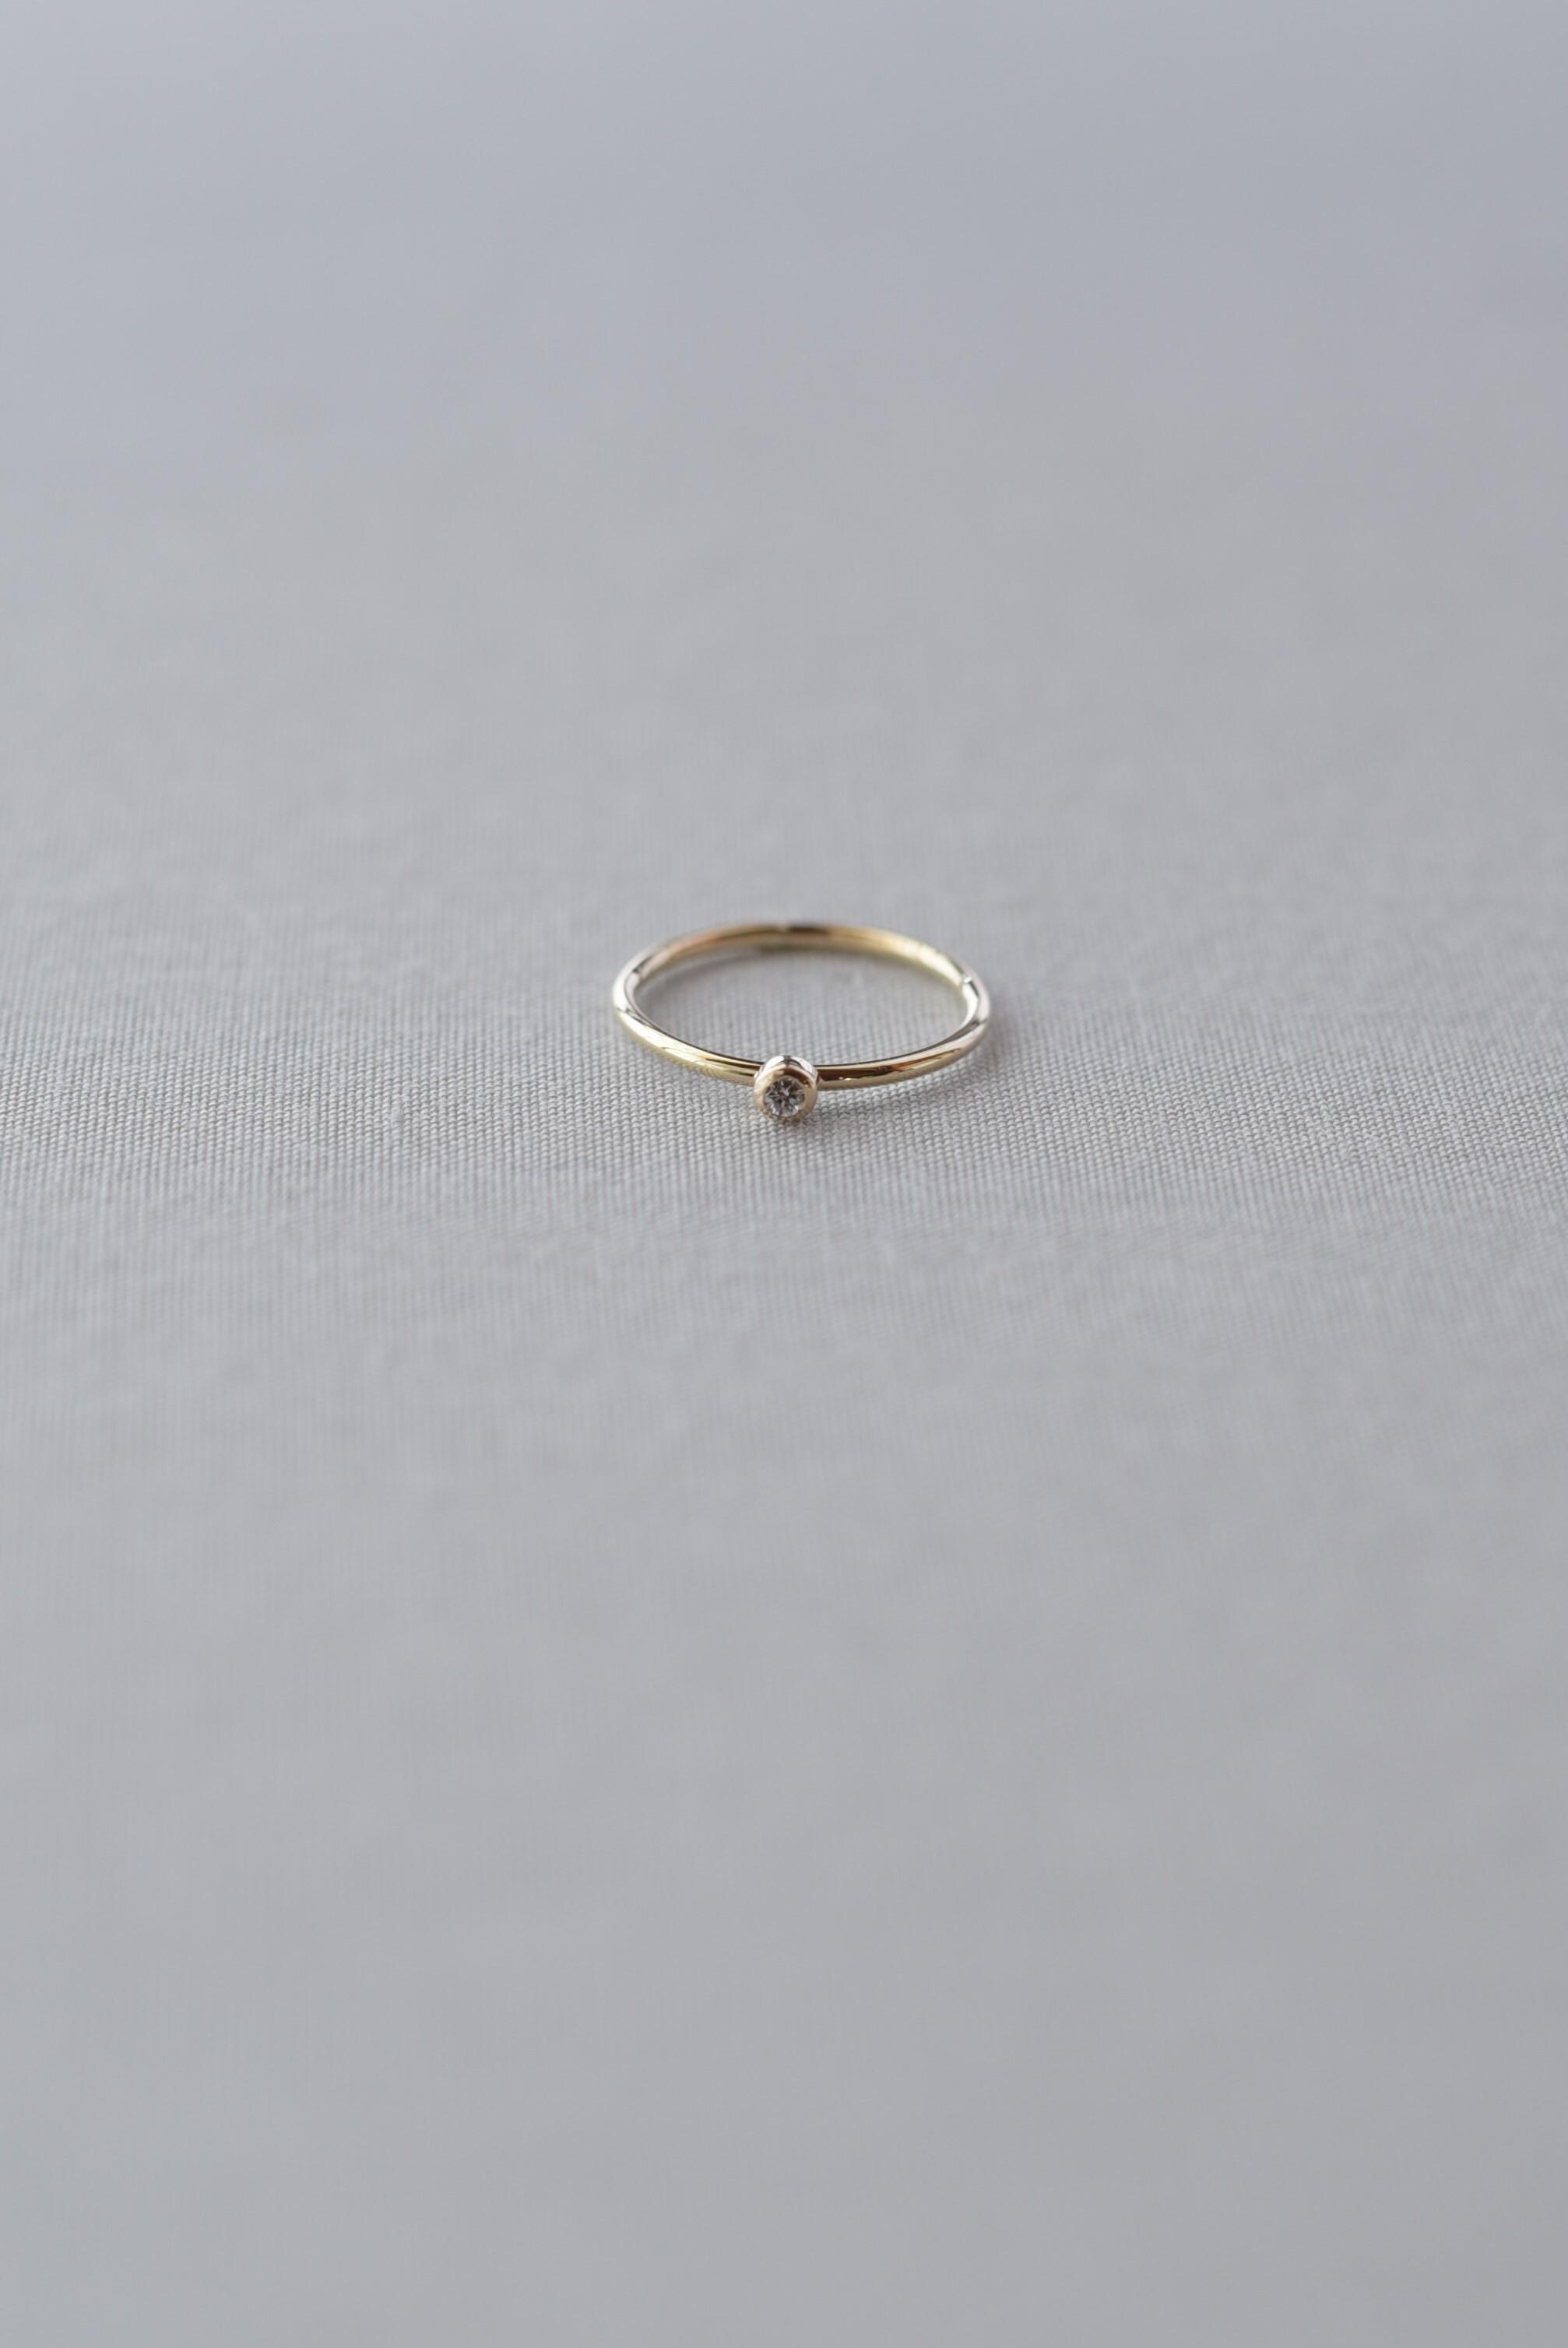 accesories mau|R-35-2 ダイヤモンドピンキー ring